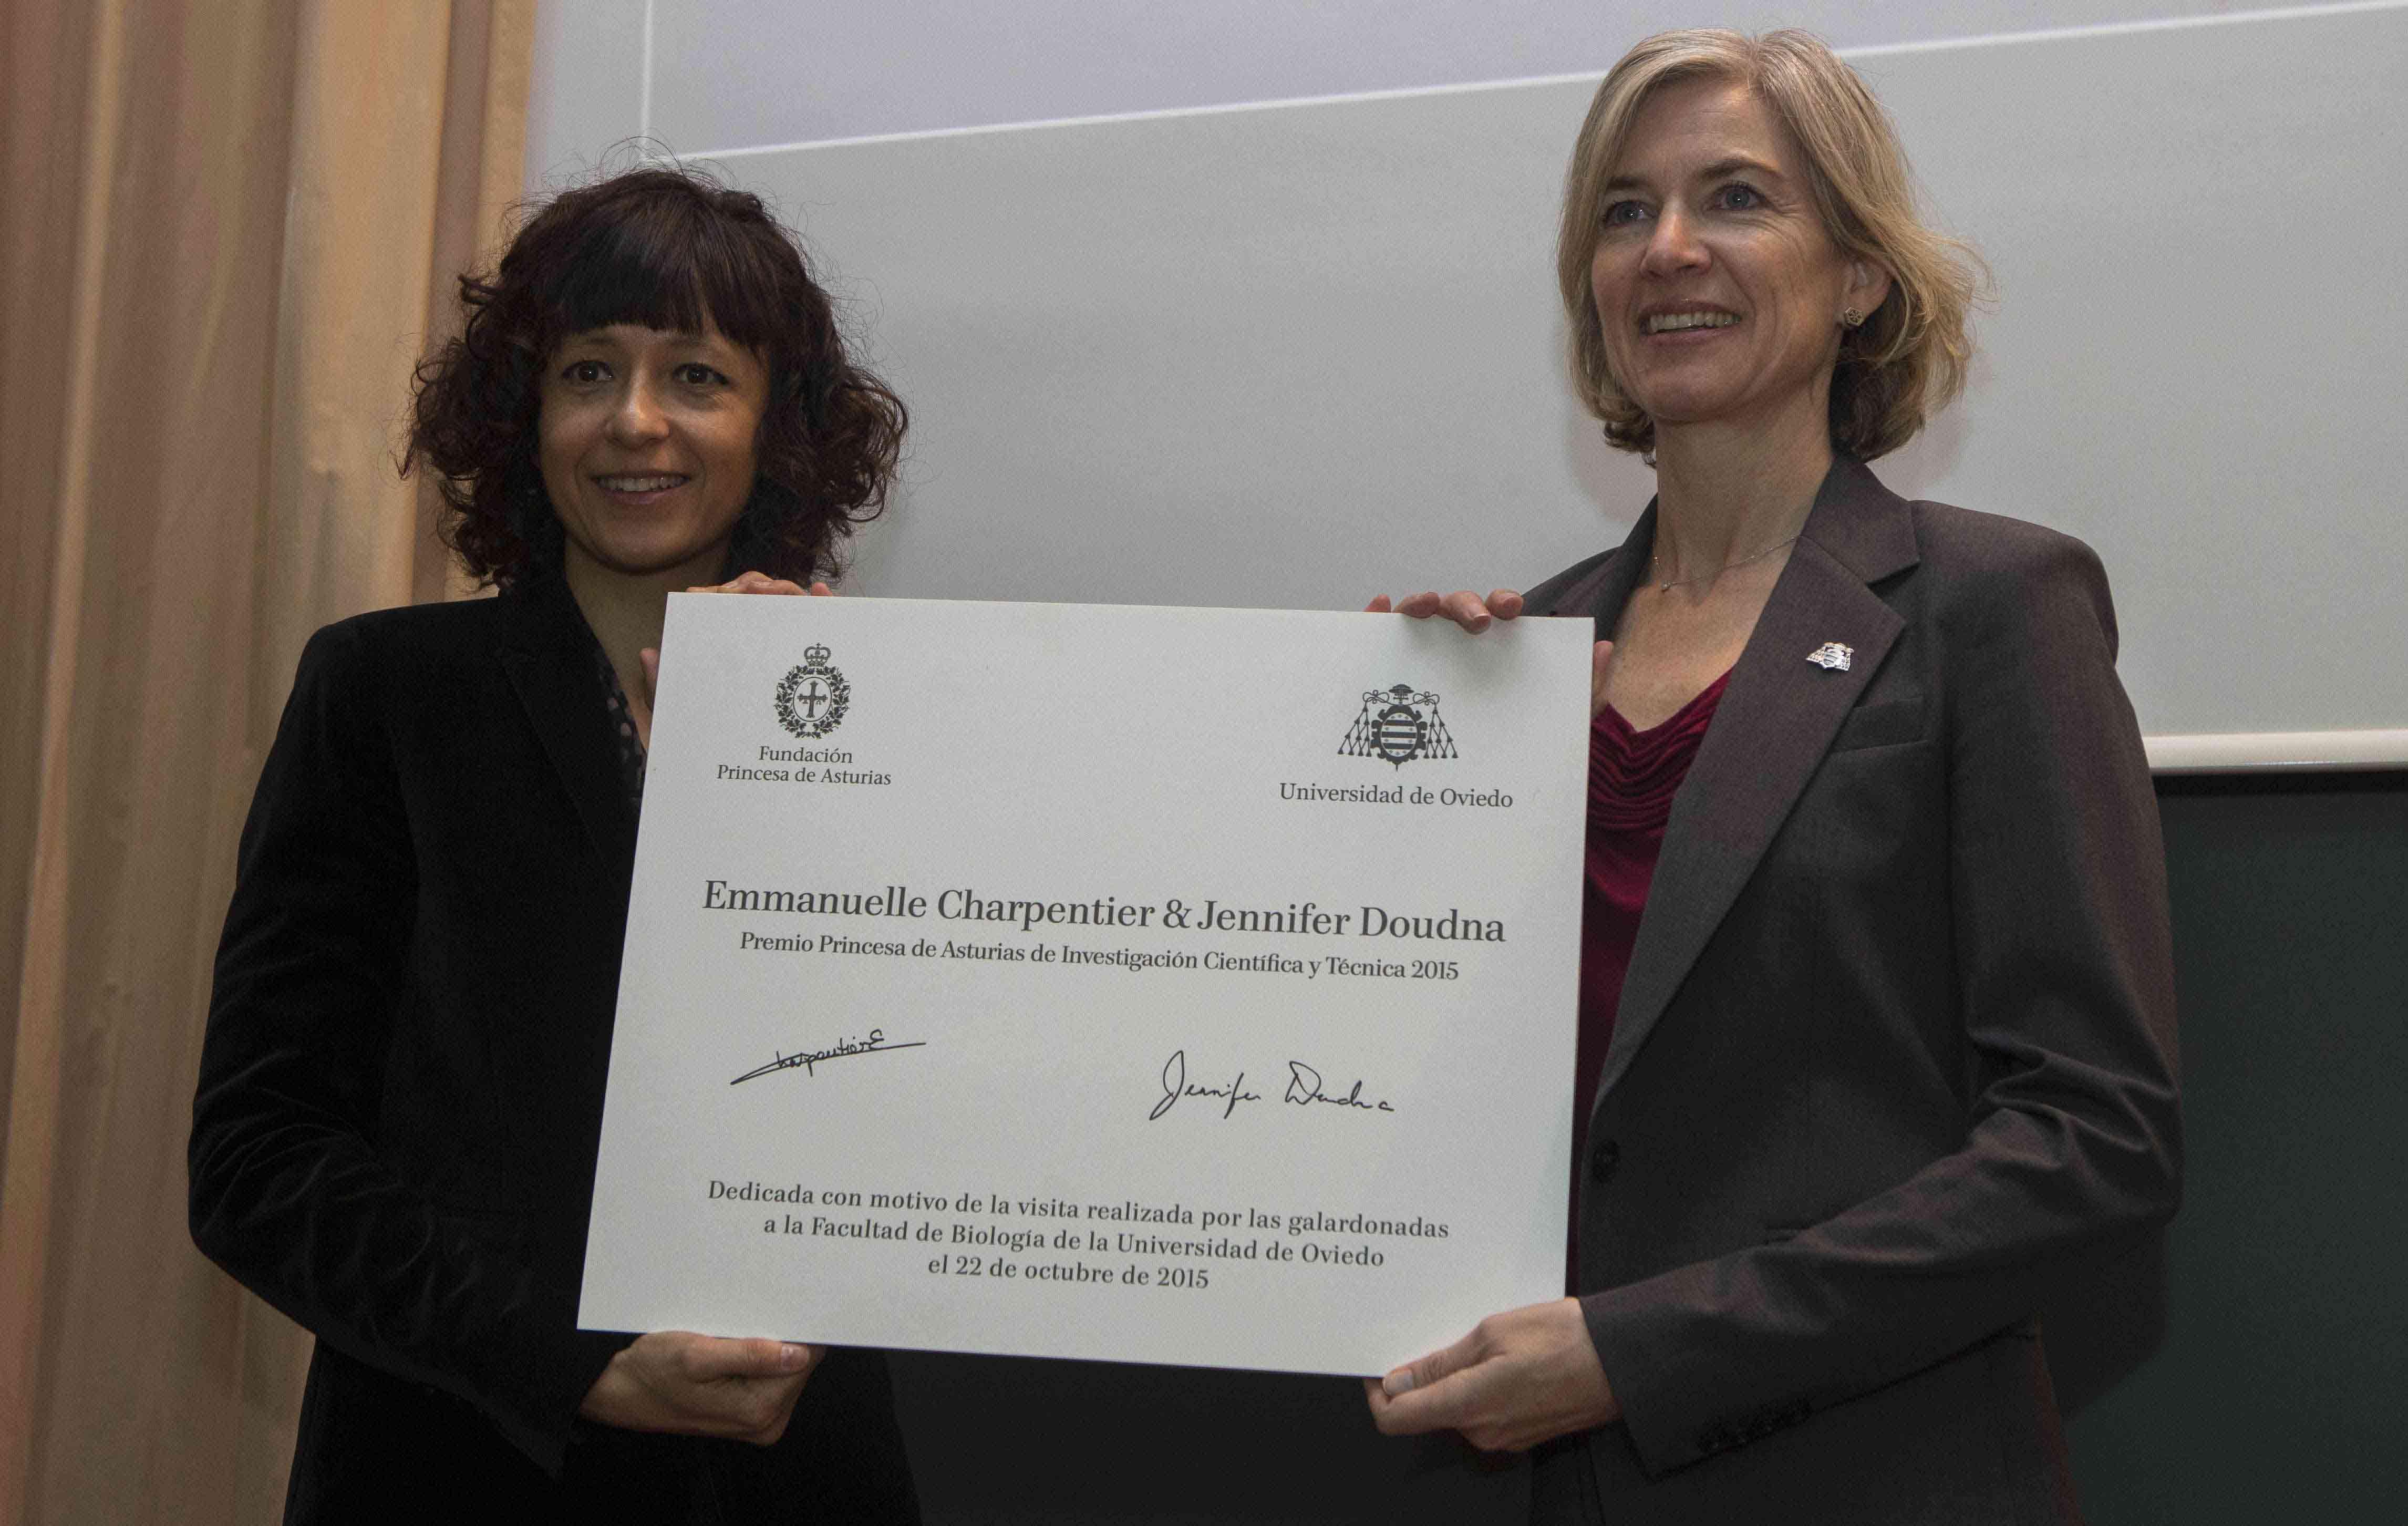 Conferencia Jennifer Doudna y Emmanuelle Charpentier